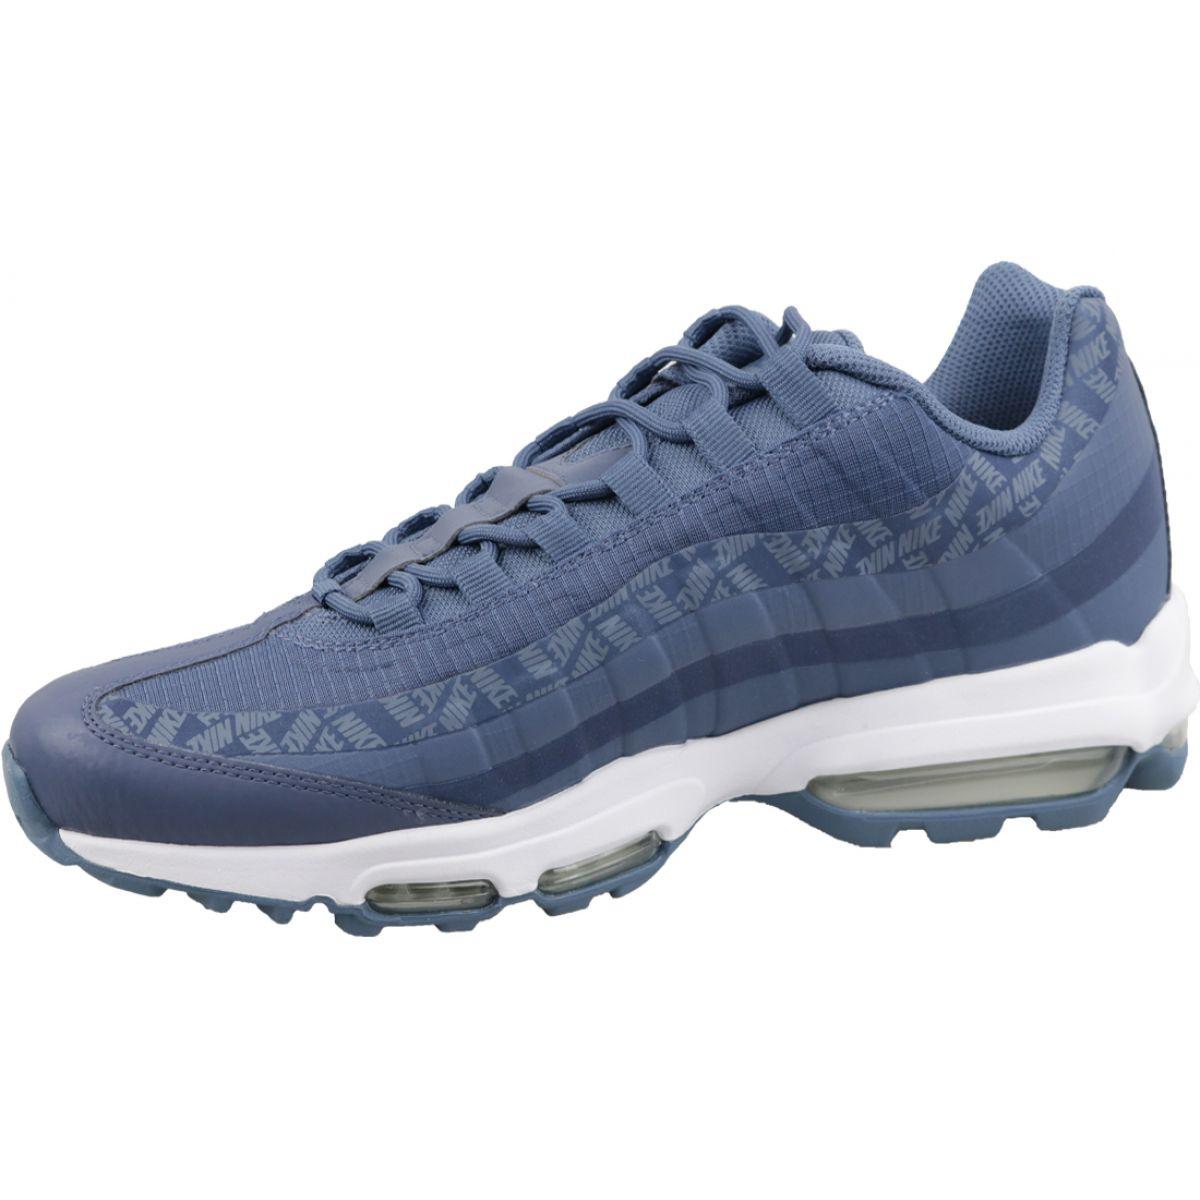 Calidad Oficial, Adecuado Nike Air Max IVO Leather Blanco